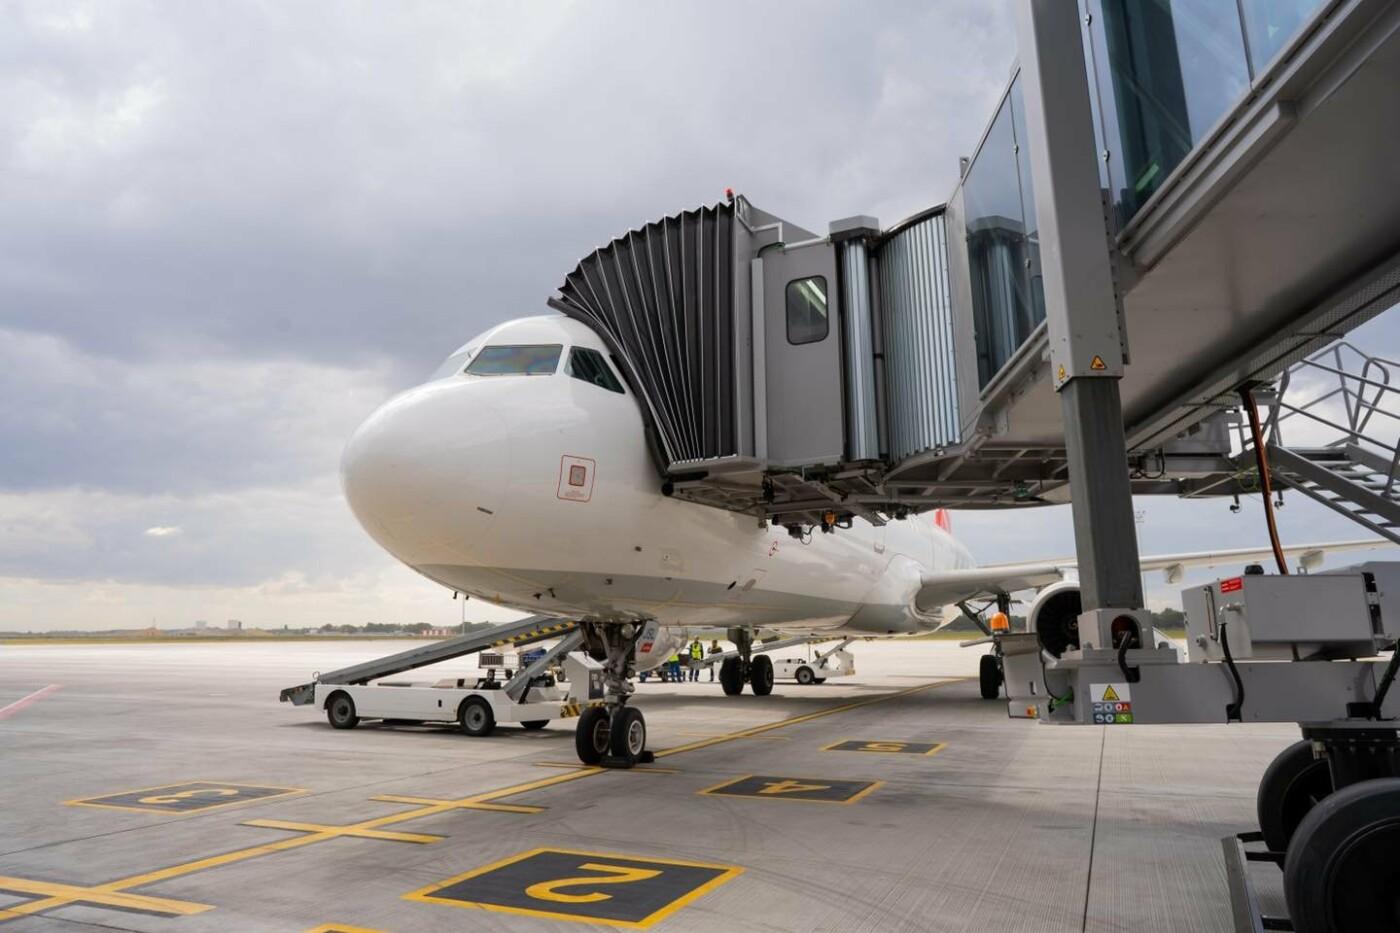 В одесском аэропорту заработал телетрап, - ФОТО, фото-2